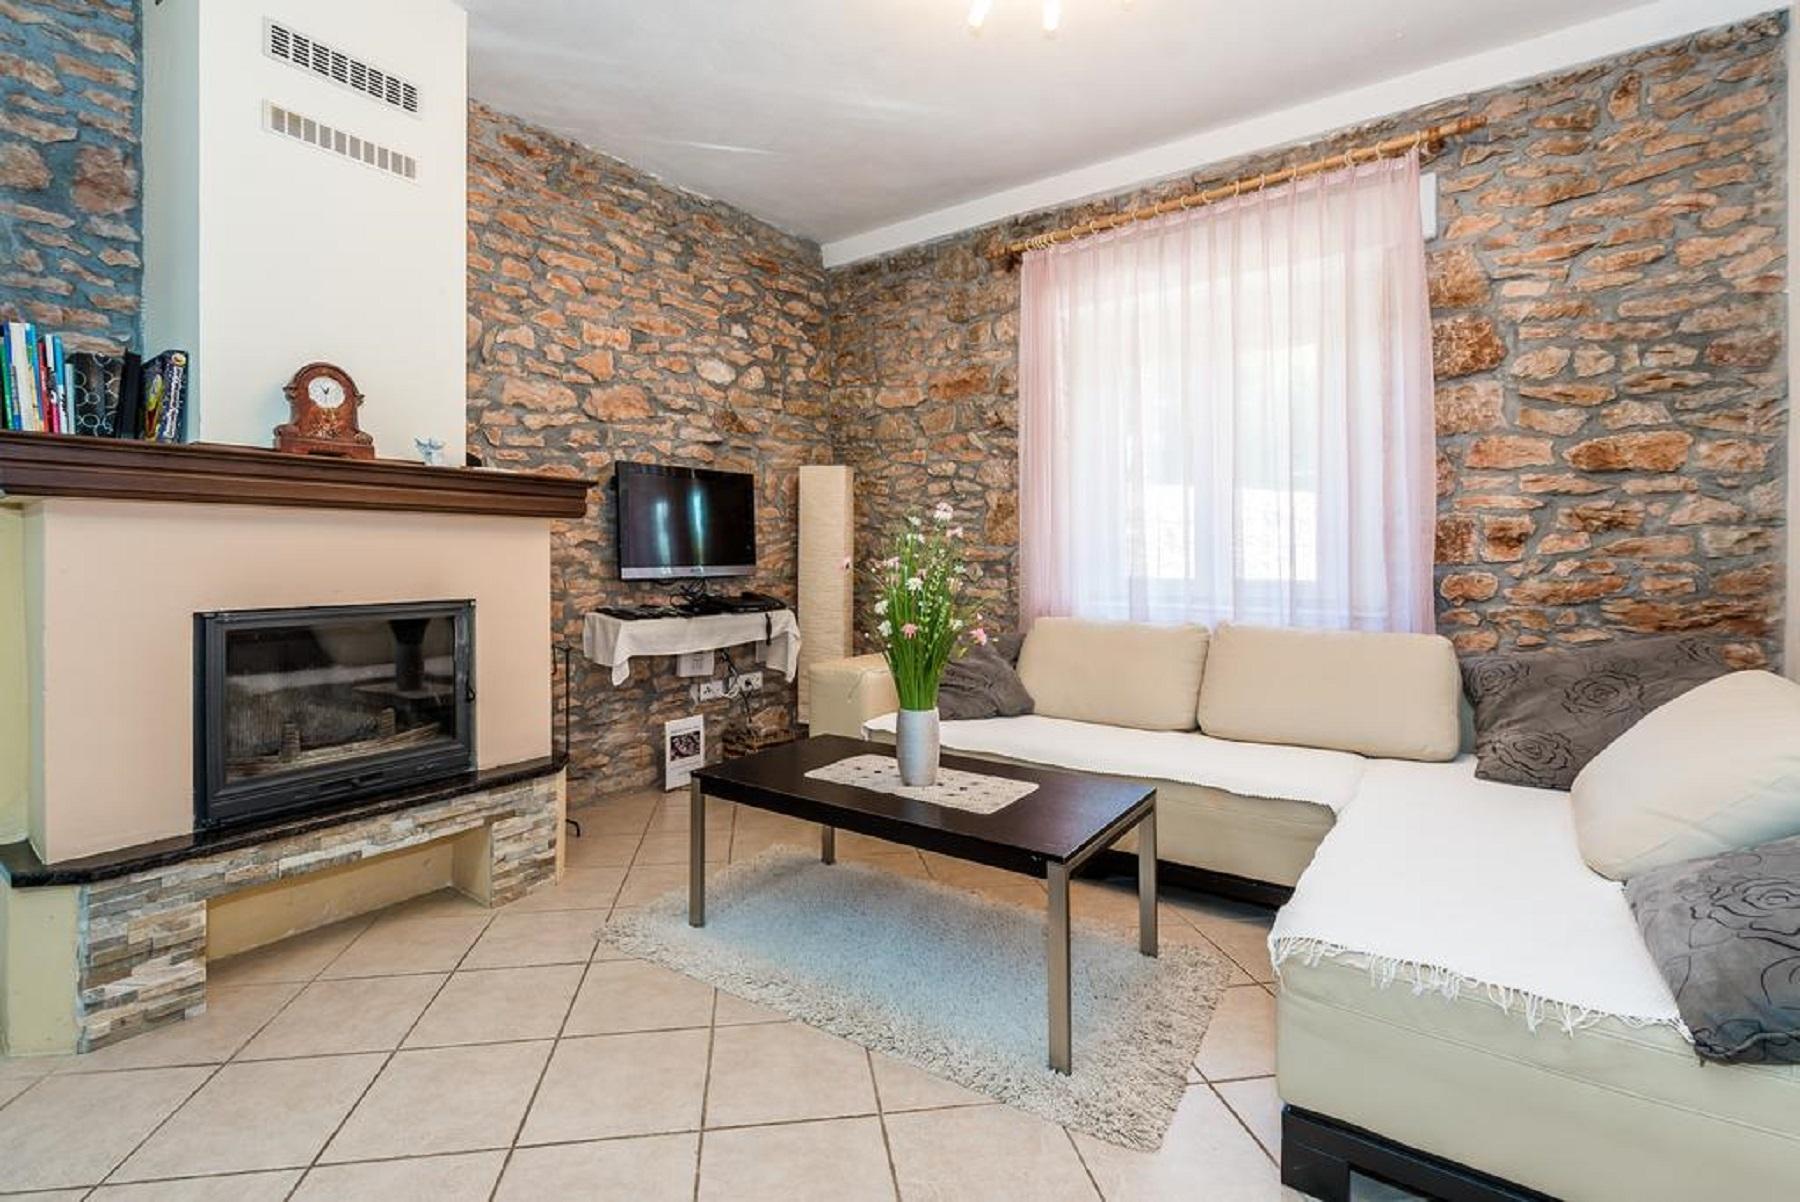 Willa Holiday house Tihomir - with pool : Drnis, Riviera Sibenik 52683, Bogatic, , Region Split Dalmacja